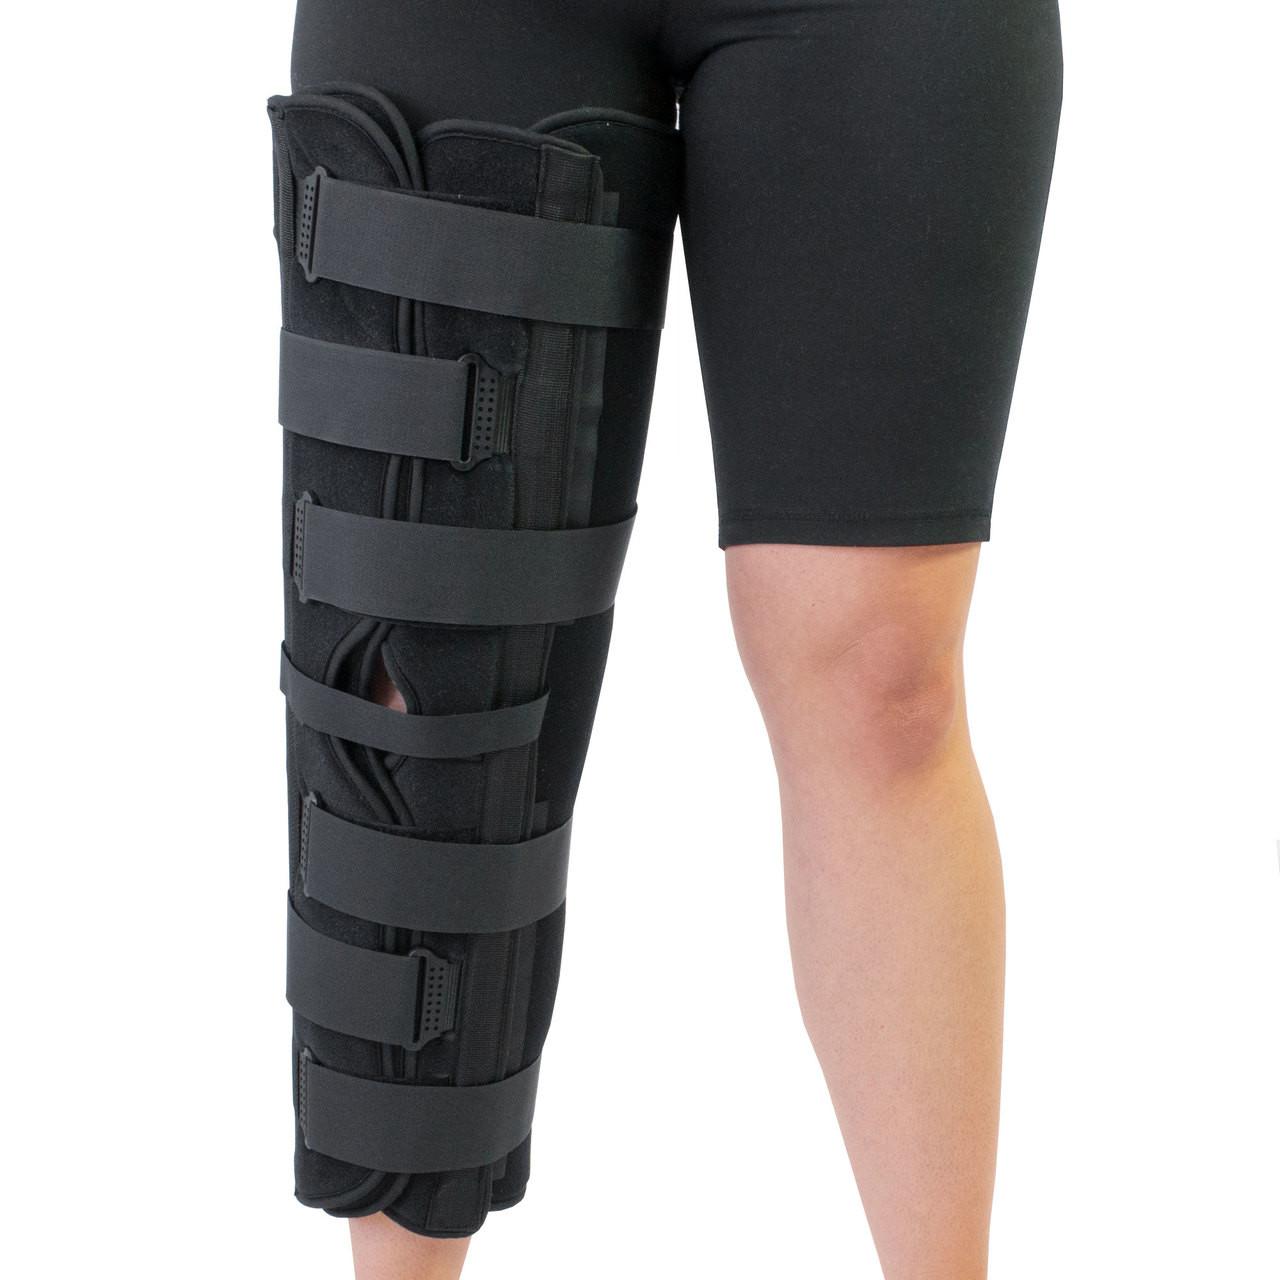 096793d911 Wraparound Knee Immobilizer Brace (Universal) - Freeman Mfg Co.